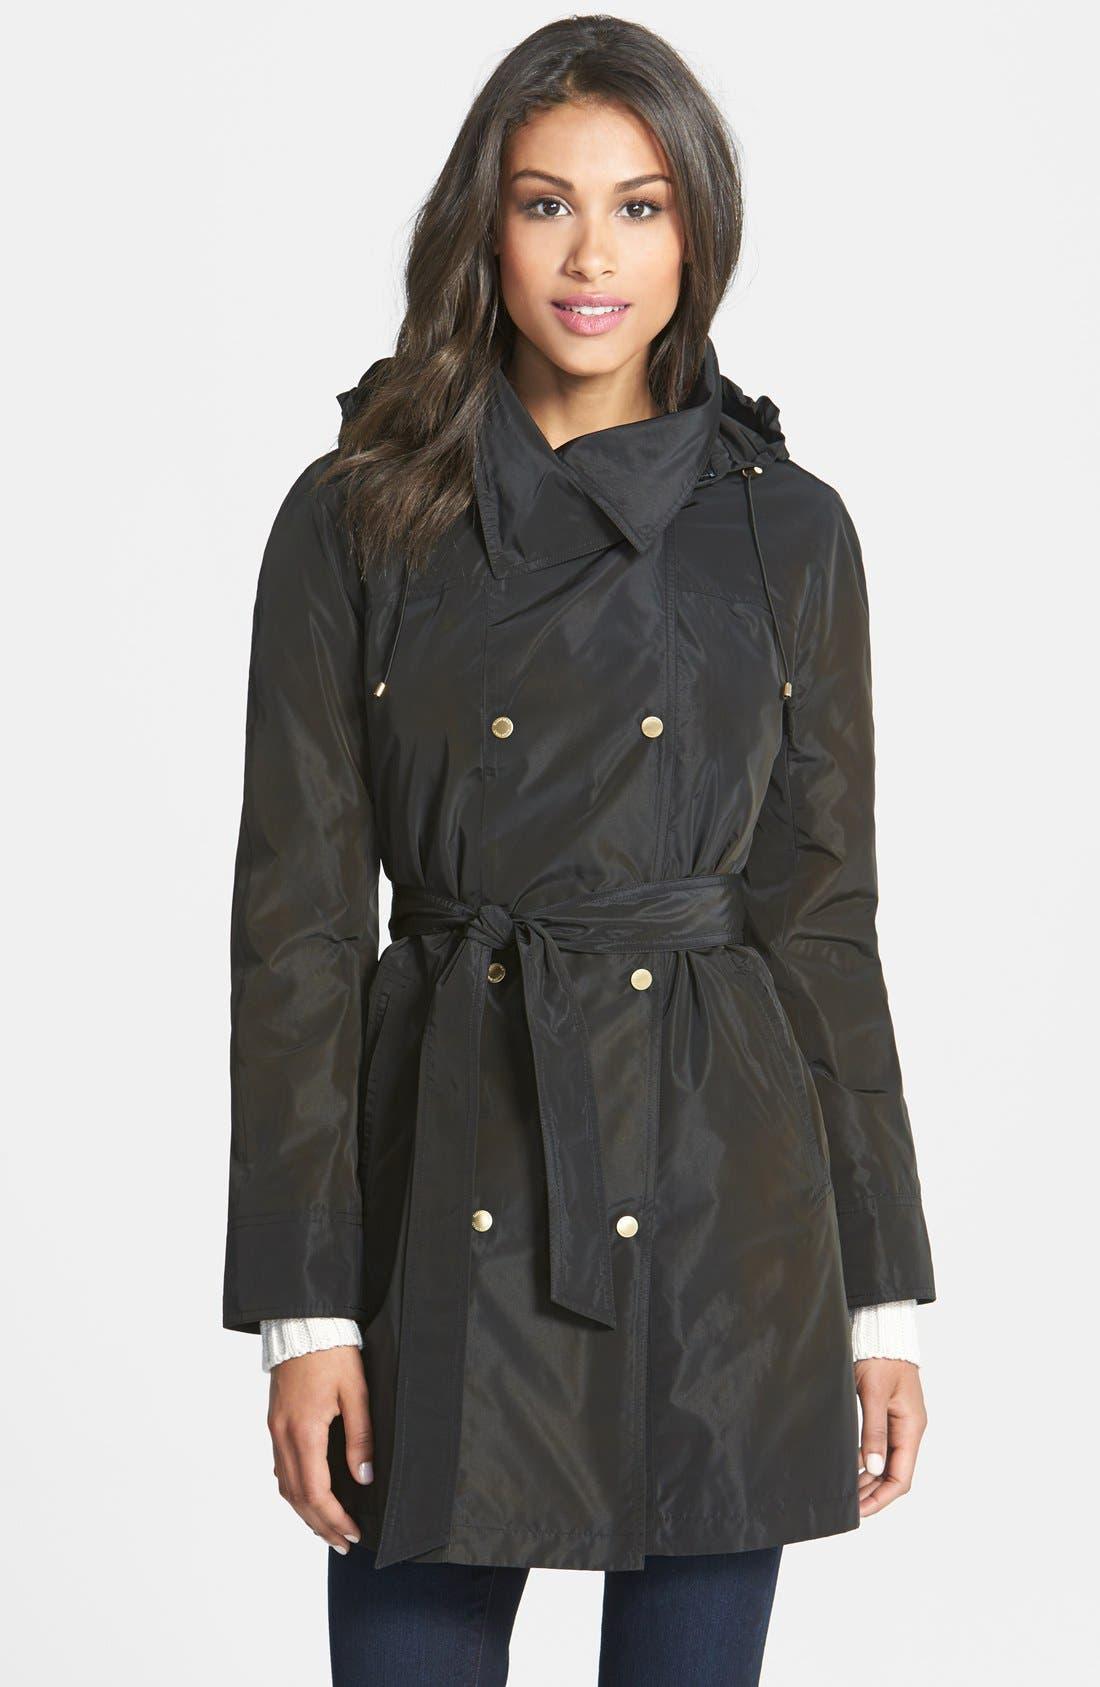 Main Image - Ellen Tracy Packable Belted Iridescent Raincoat